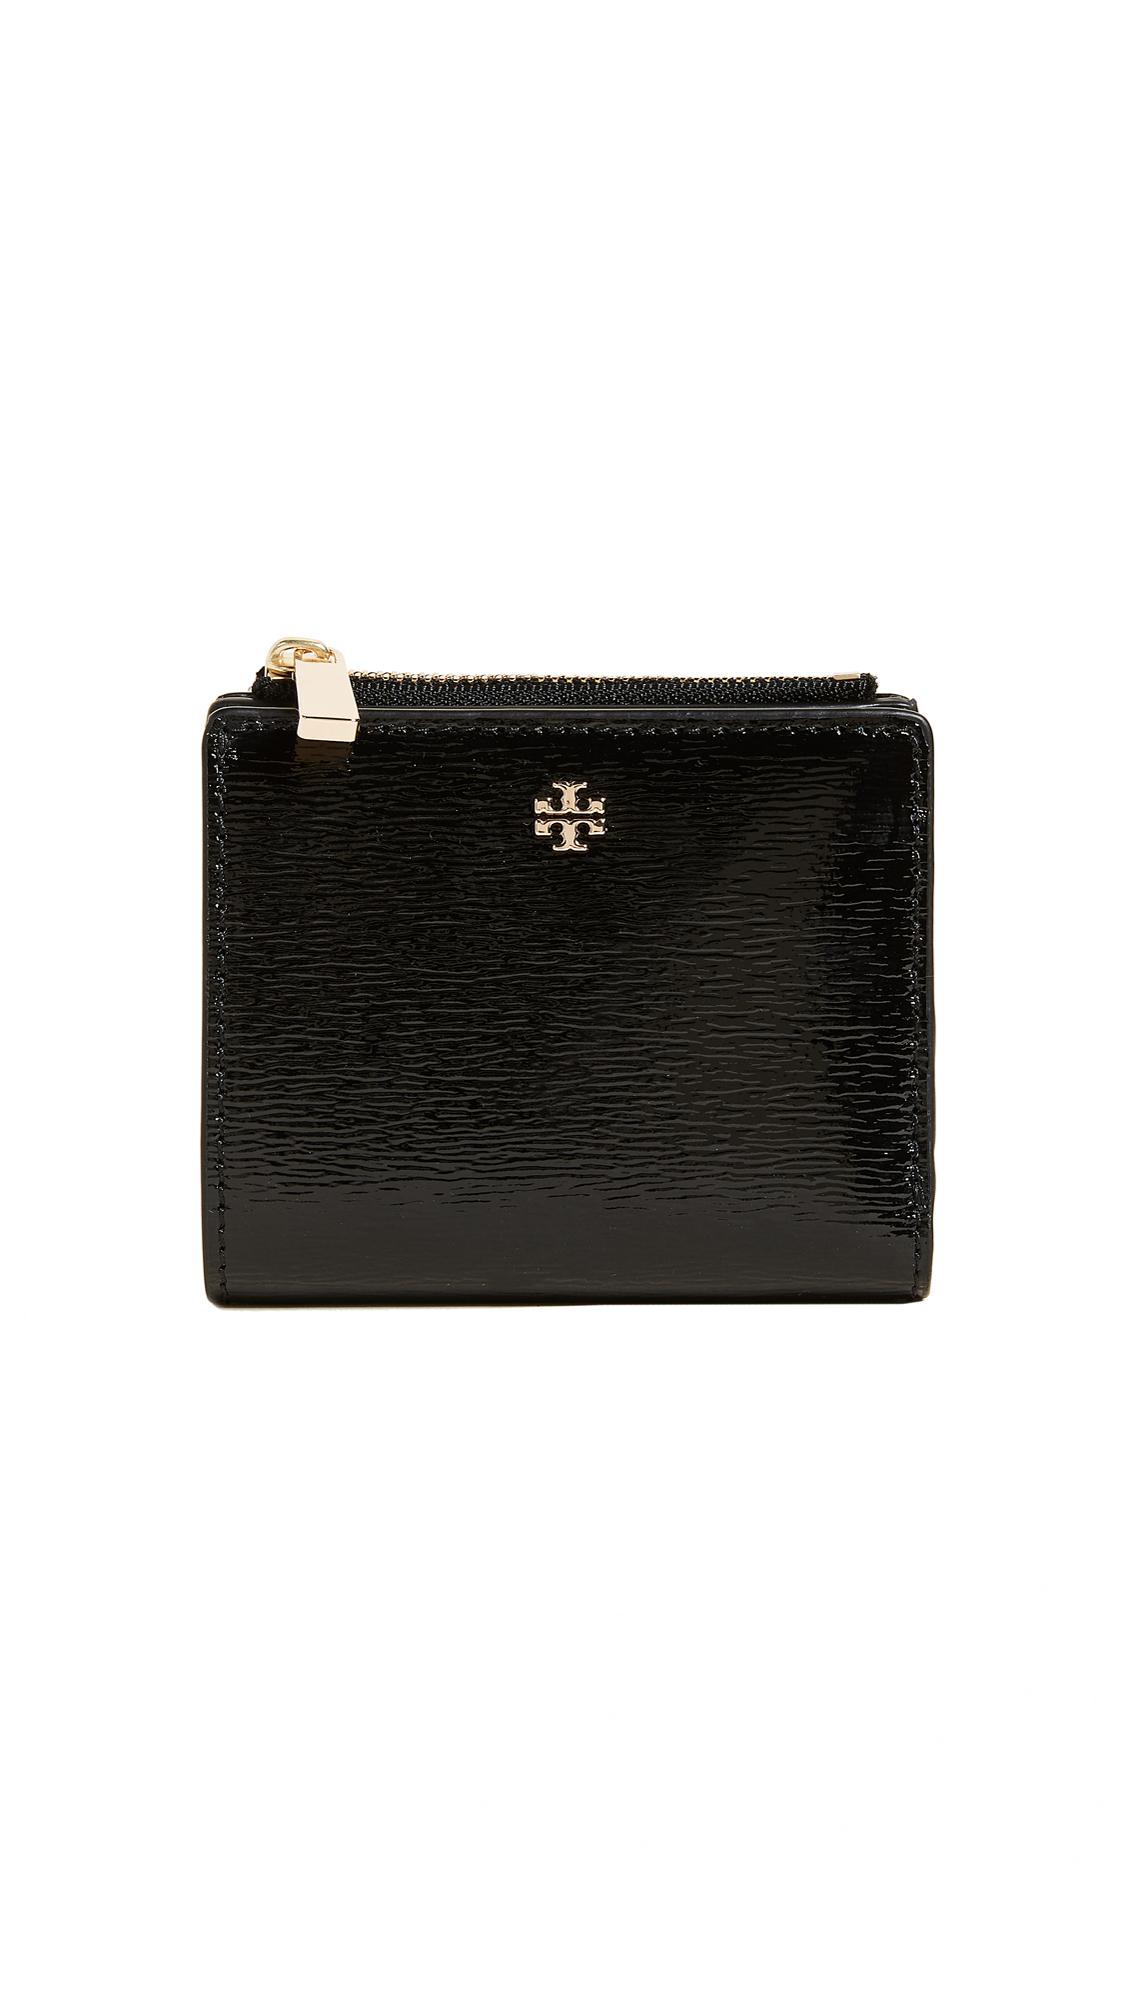 Tory Burch Robinson Patent Mini Wallet - Black